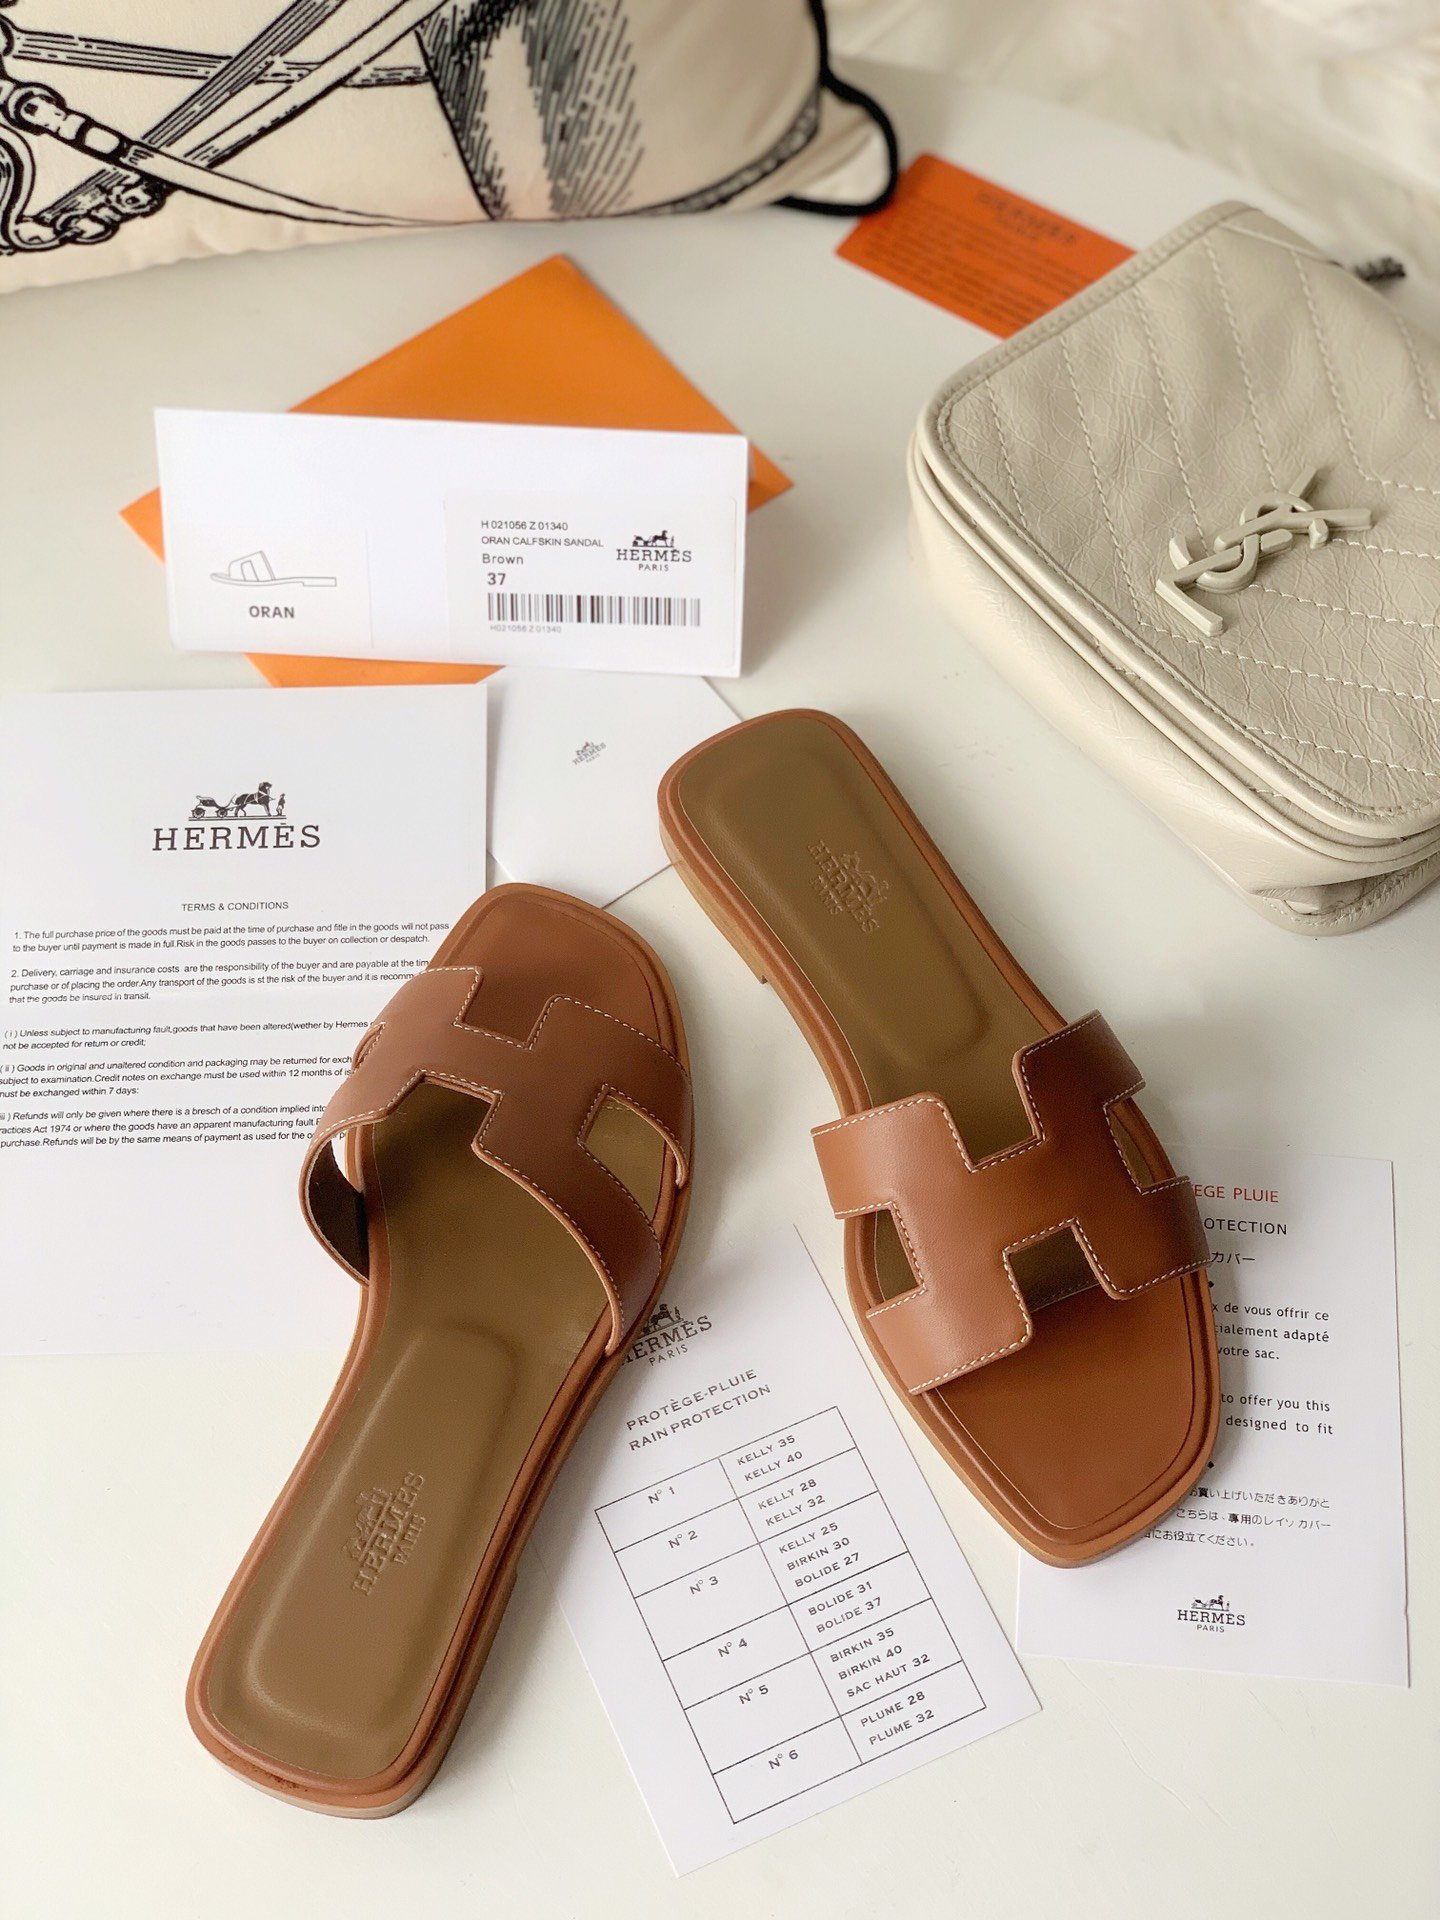 Hermes顶级版本 爱马仕经典Oran拖鞋(图7)